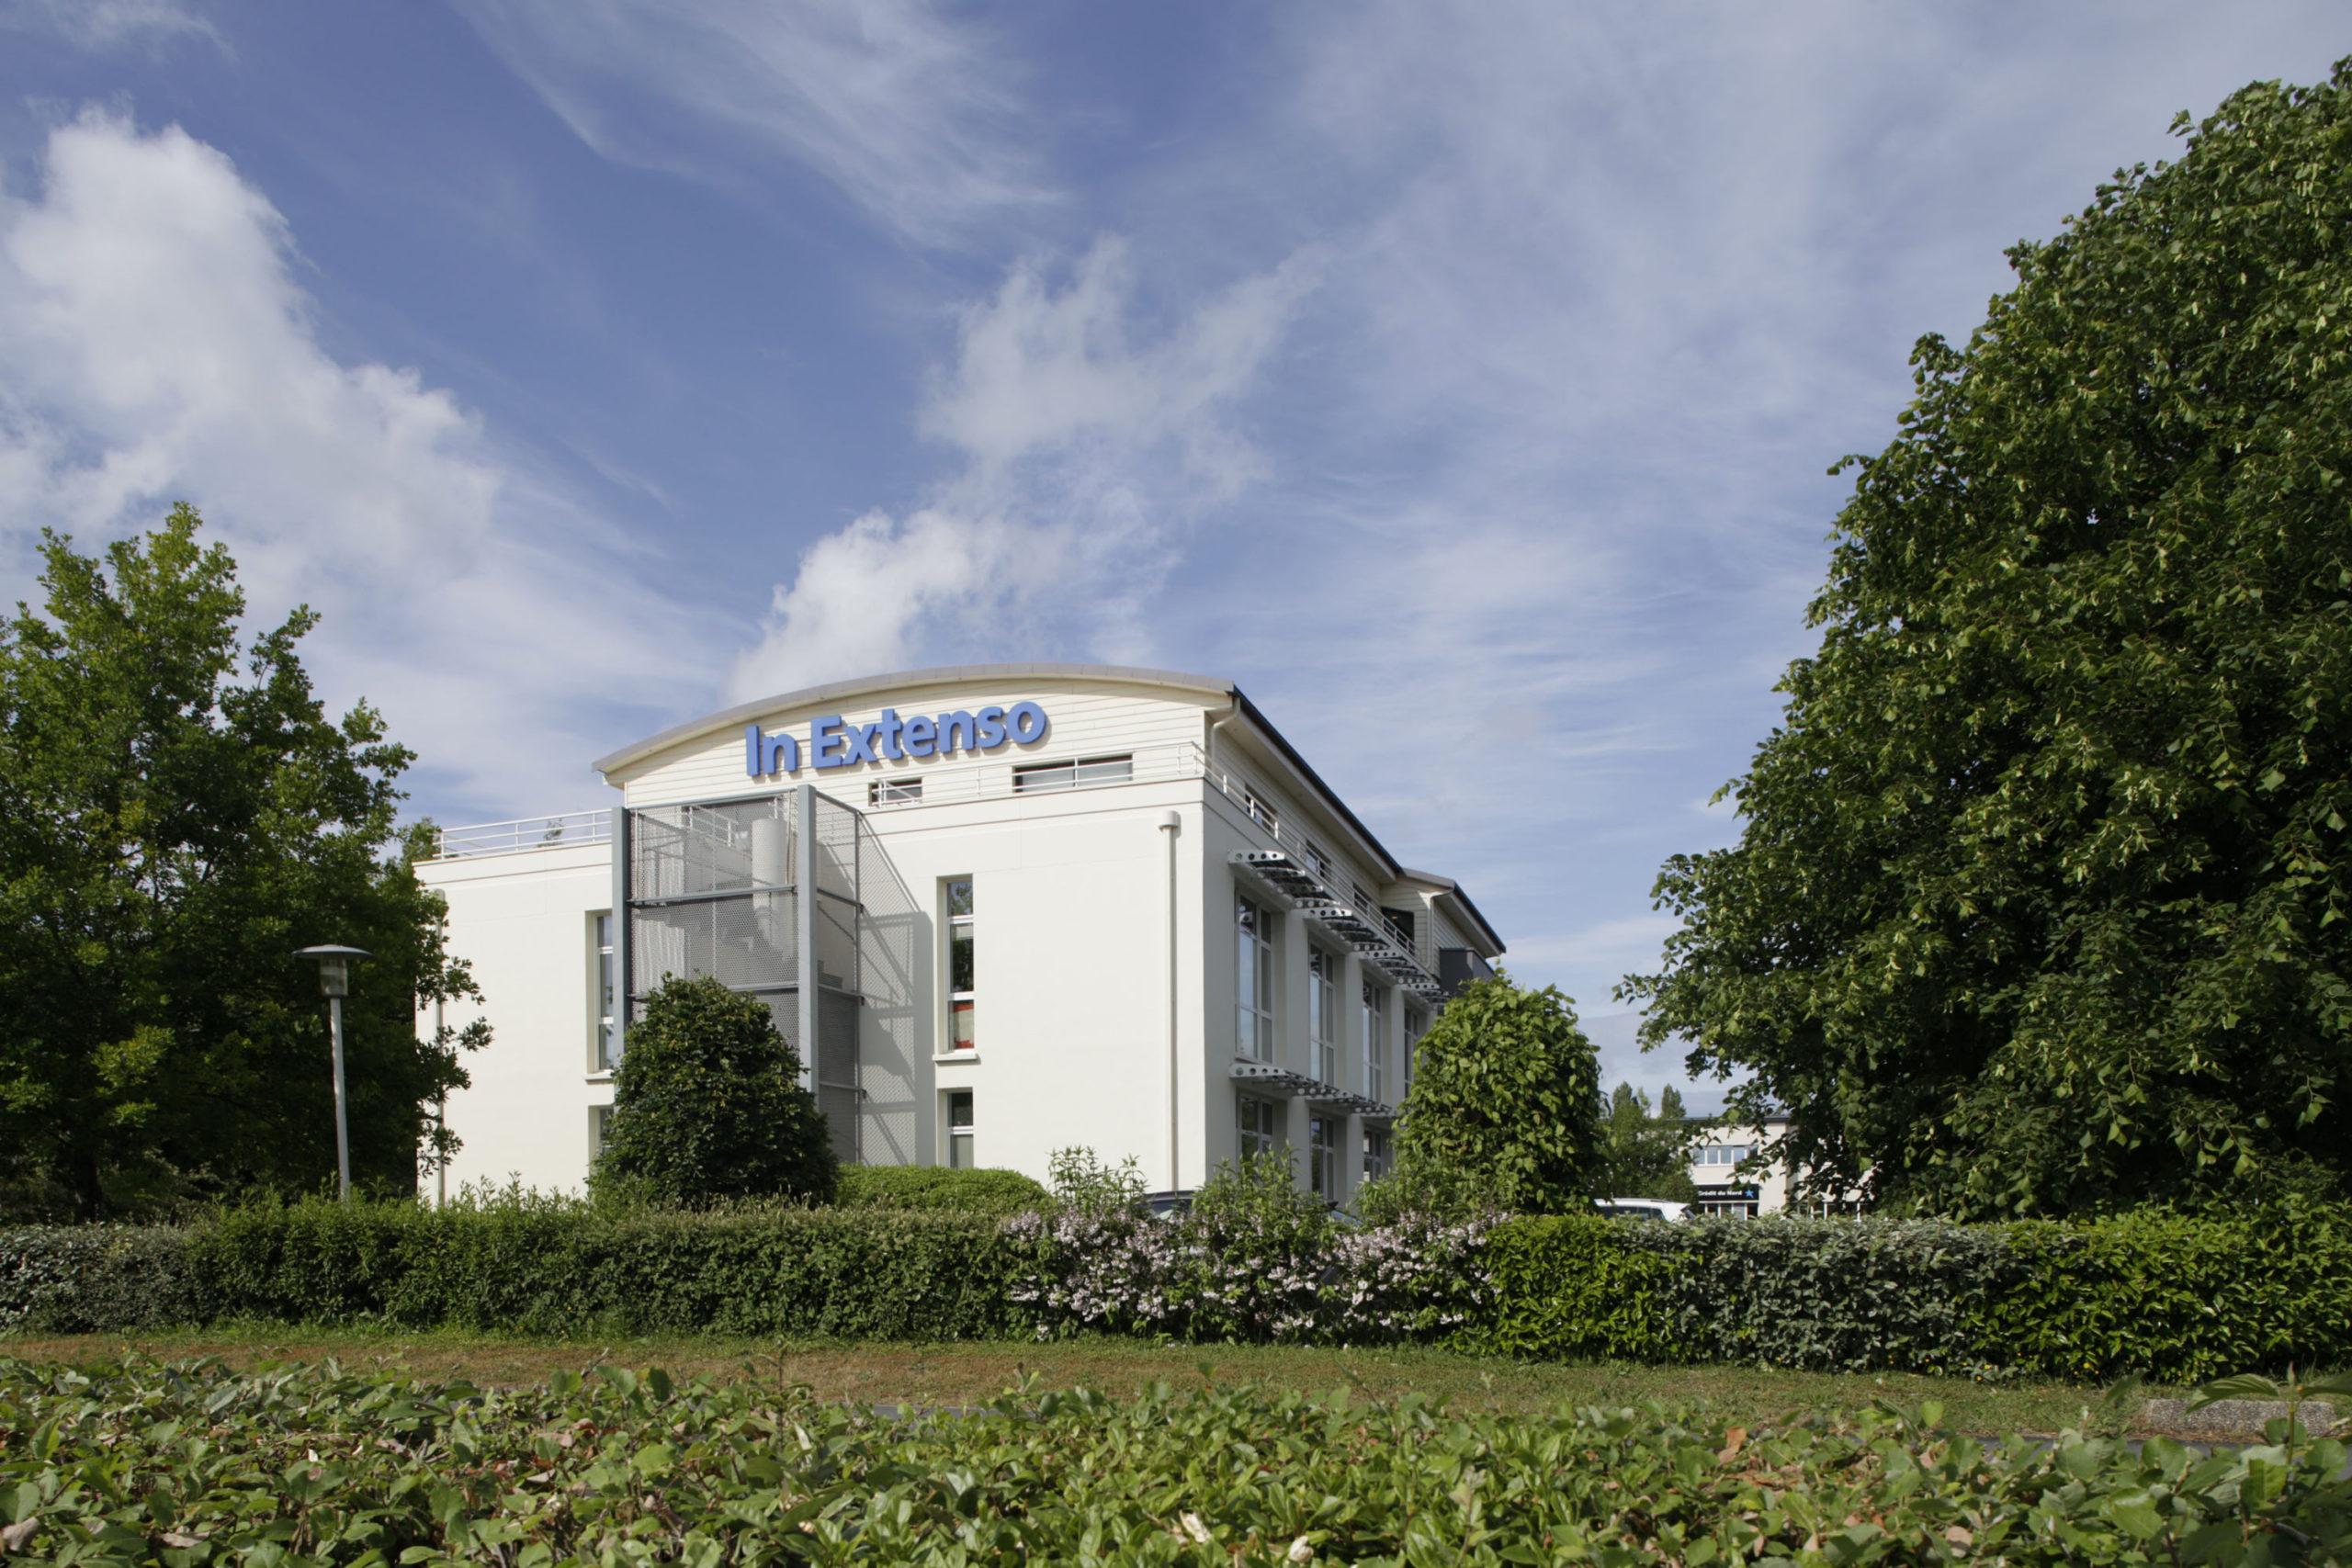 Agence Point C de Caen